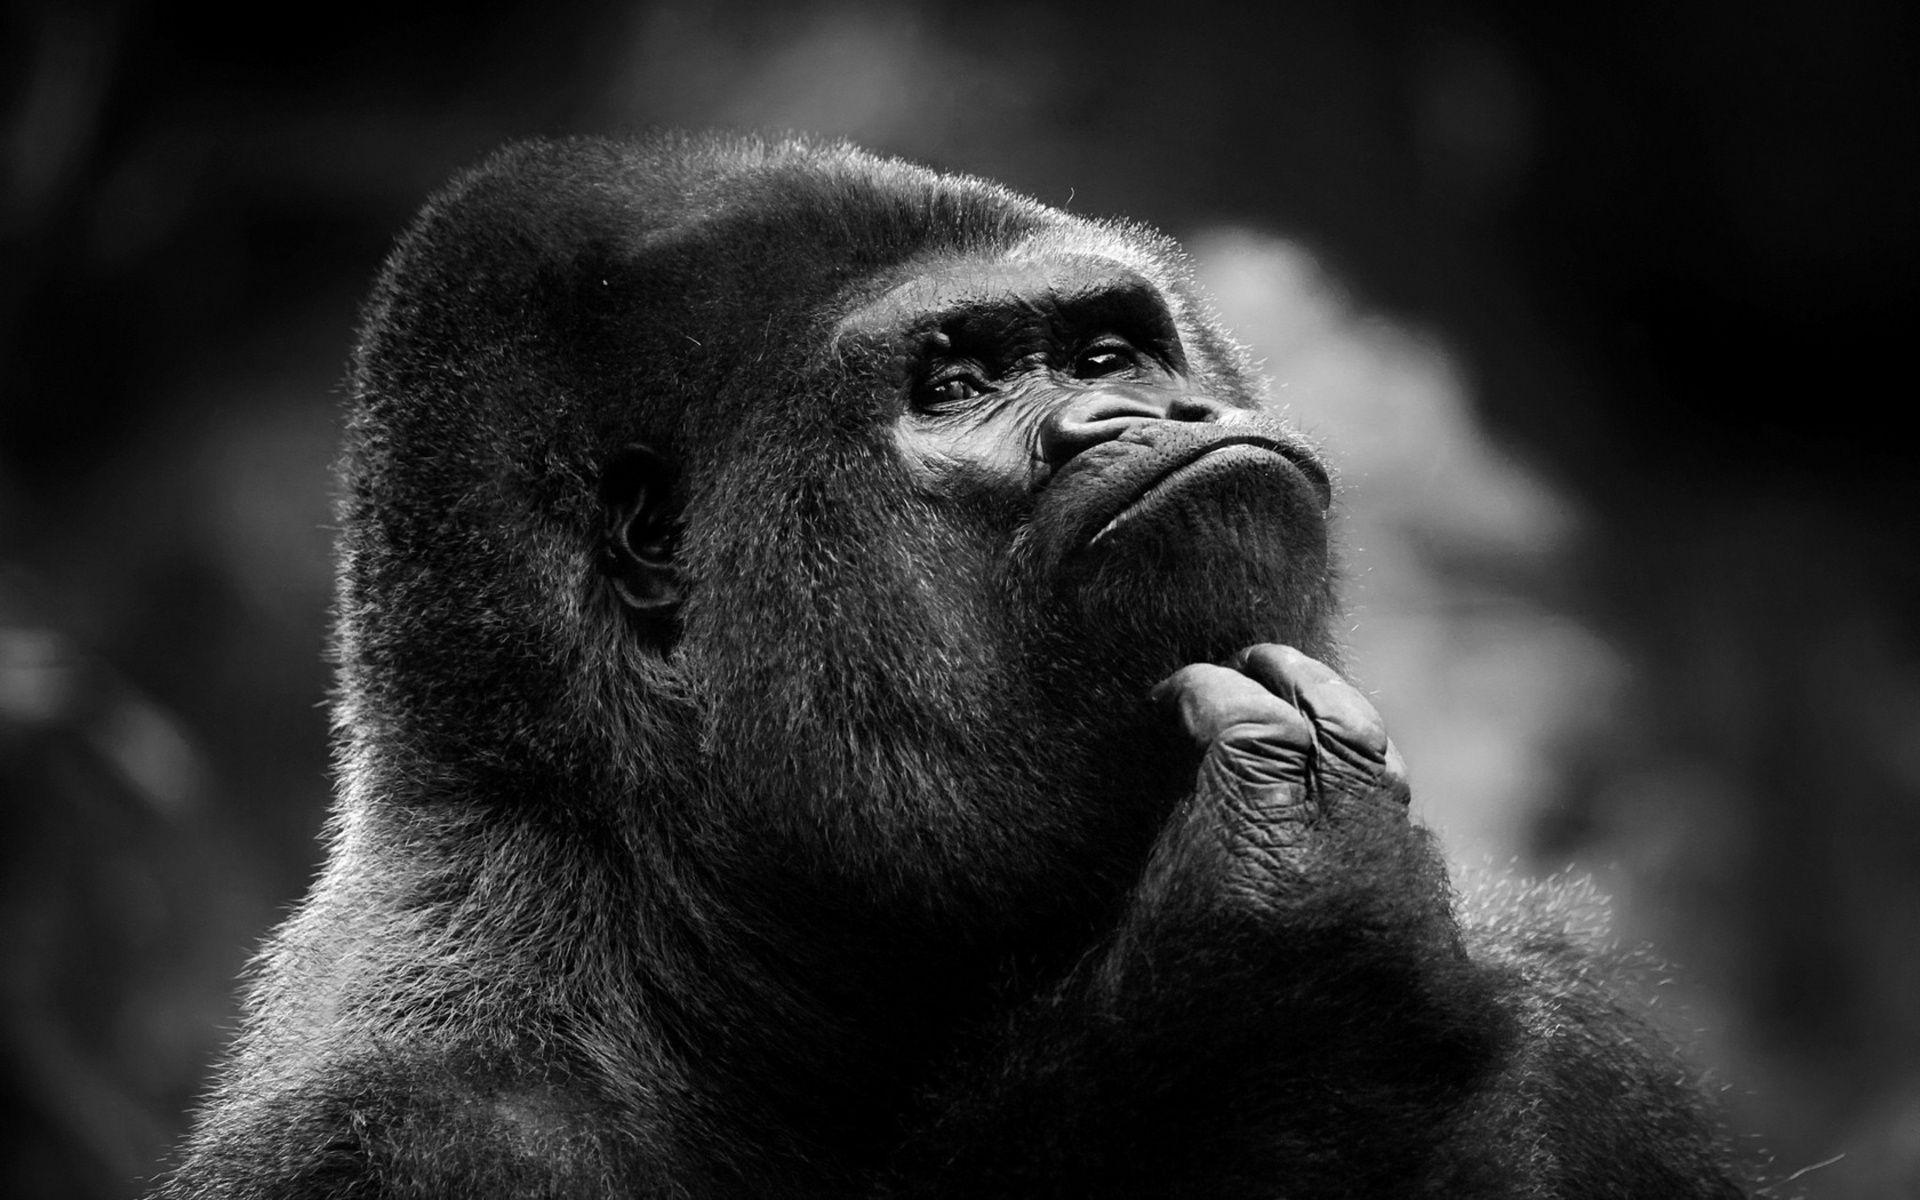 Gorilla Gorilla Wallpaper Monkey Pictures Whats Your Spirit Animal